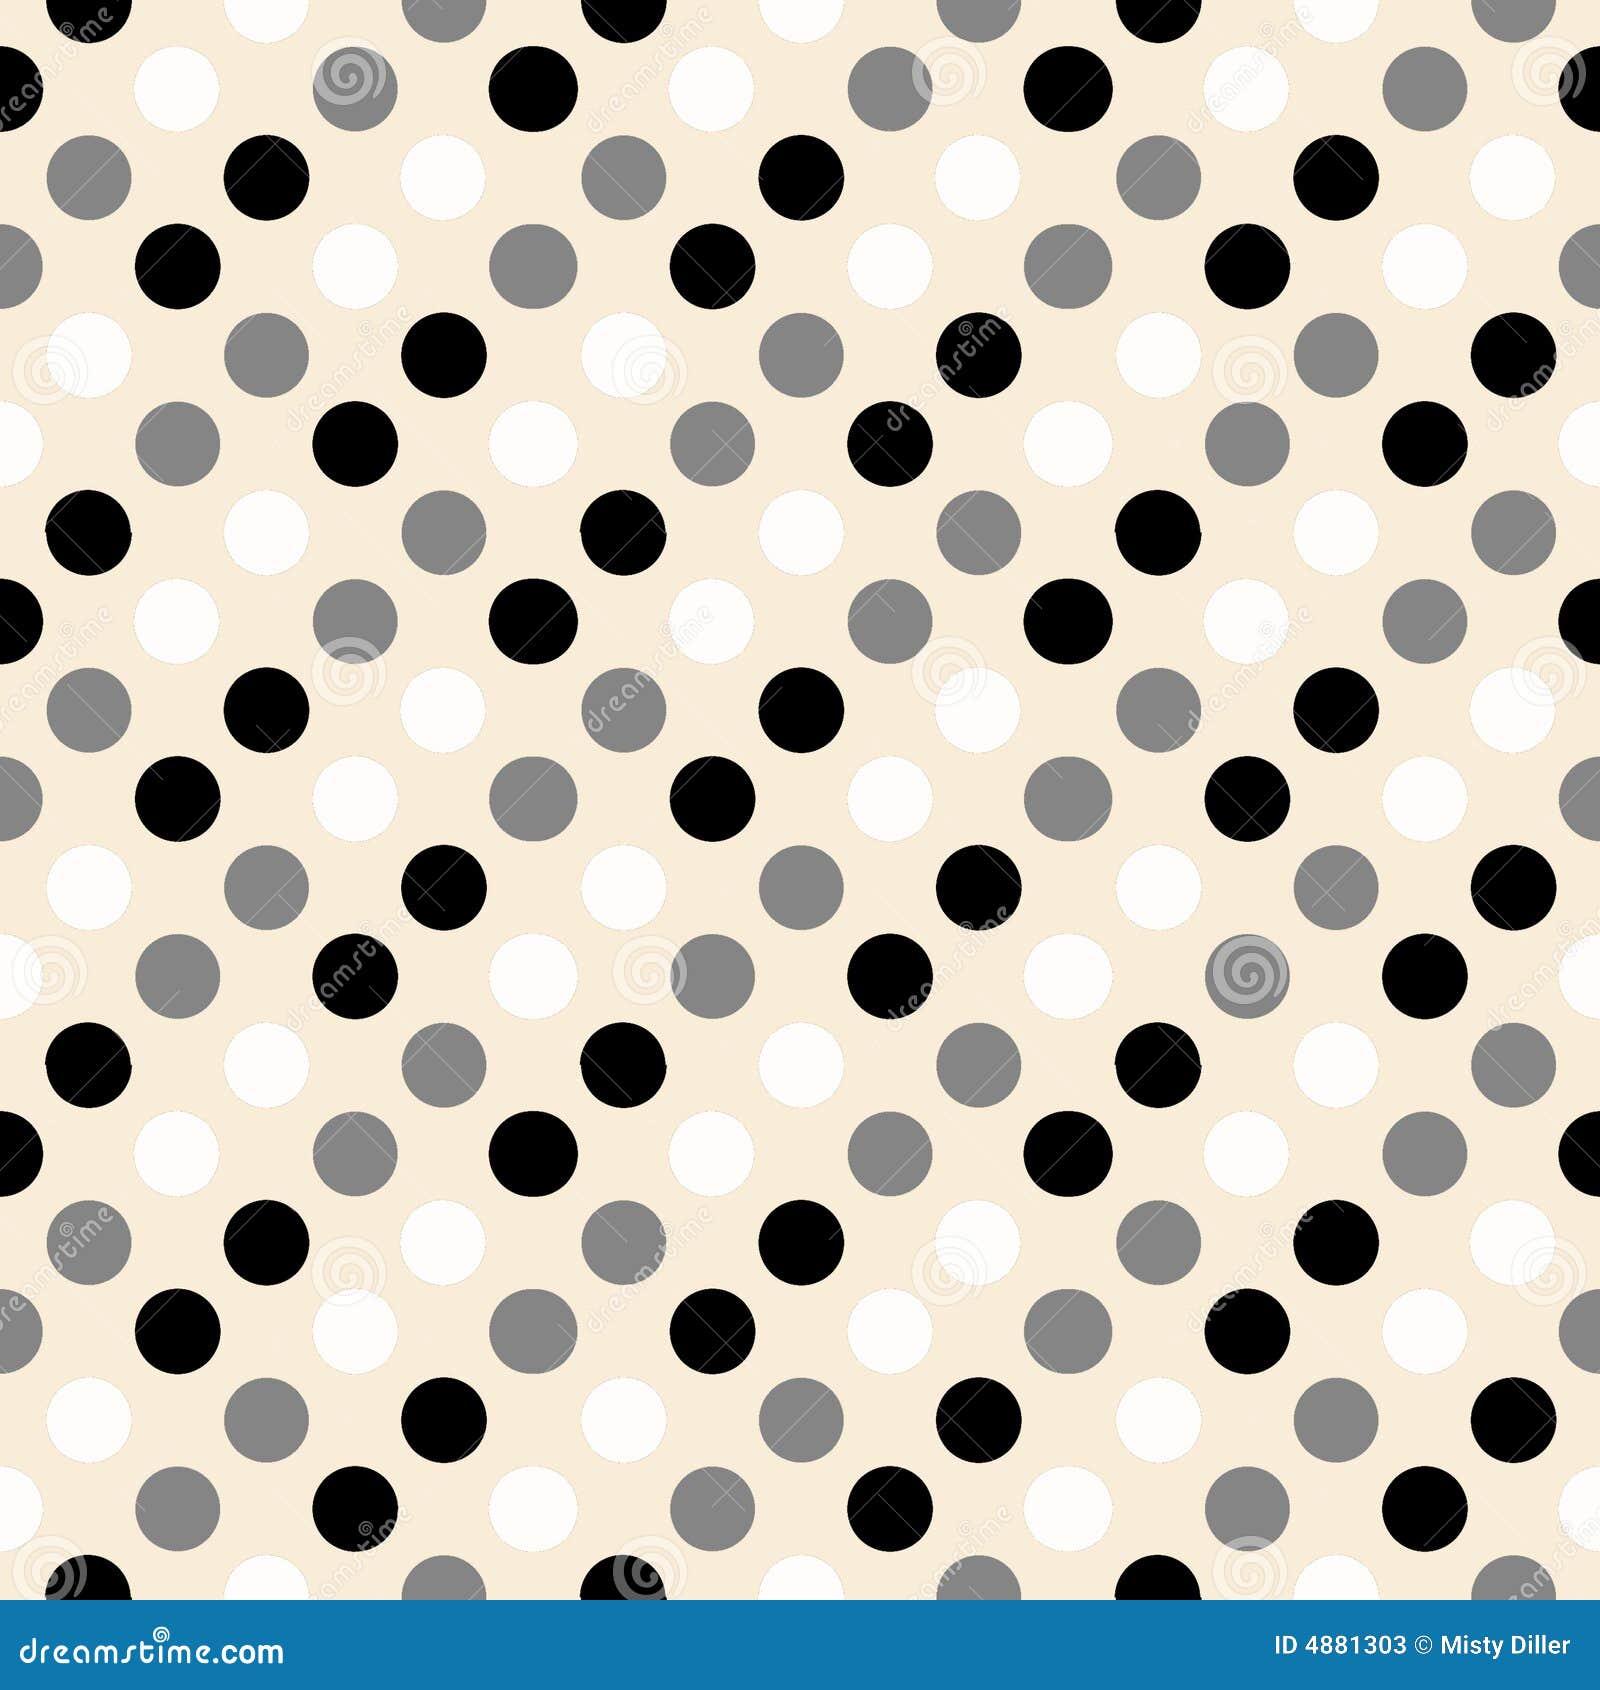 designs images polka dots - photo #22